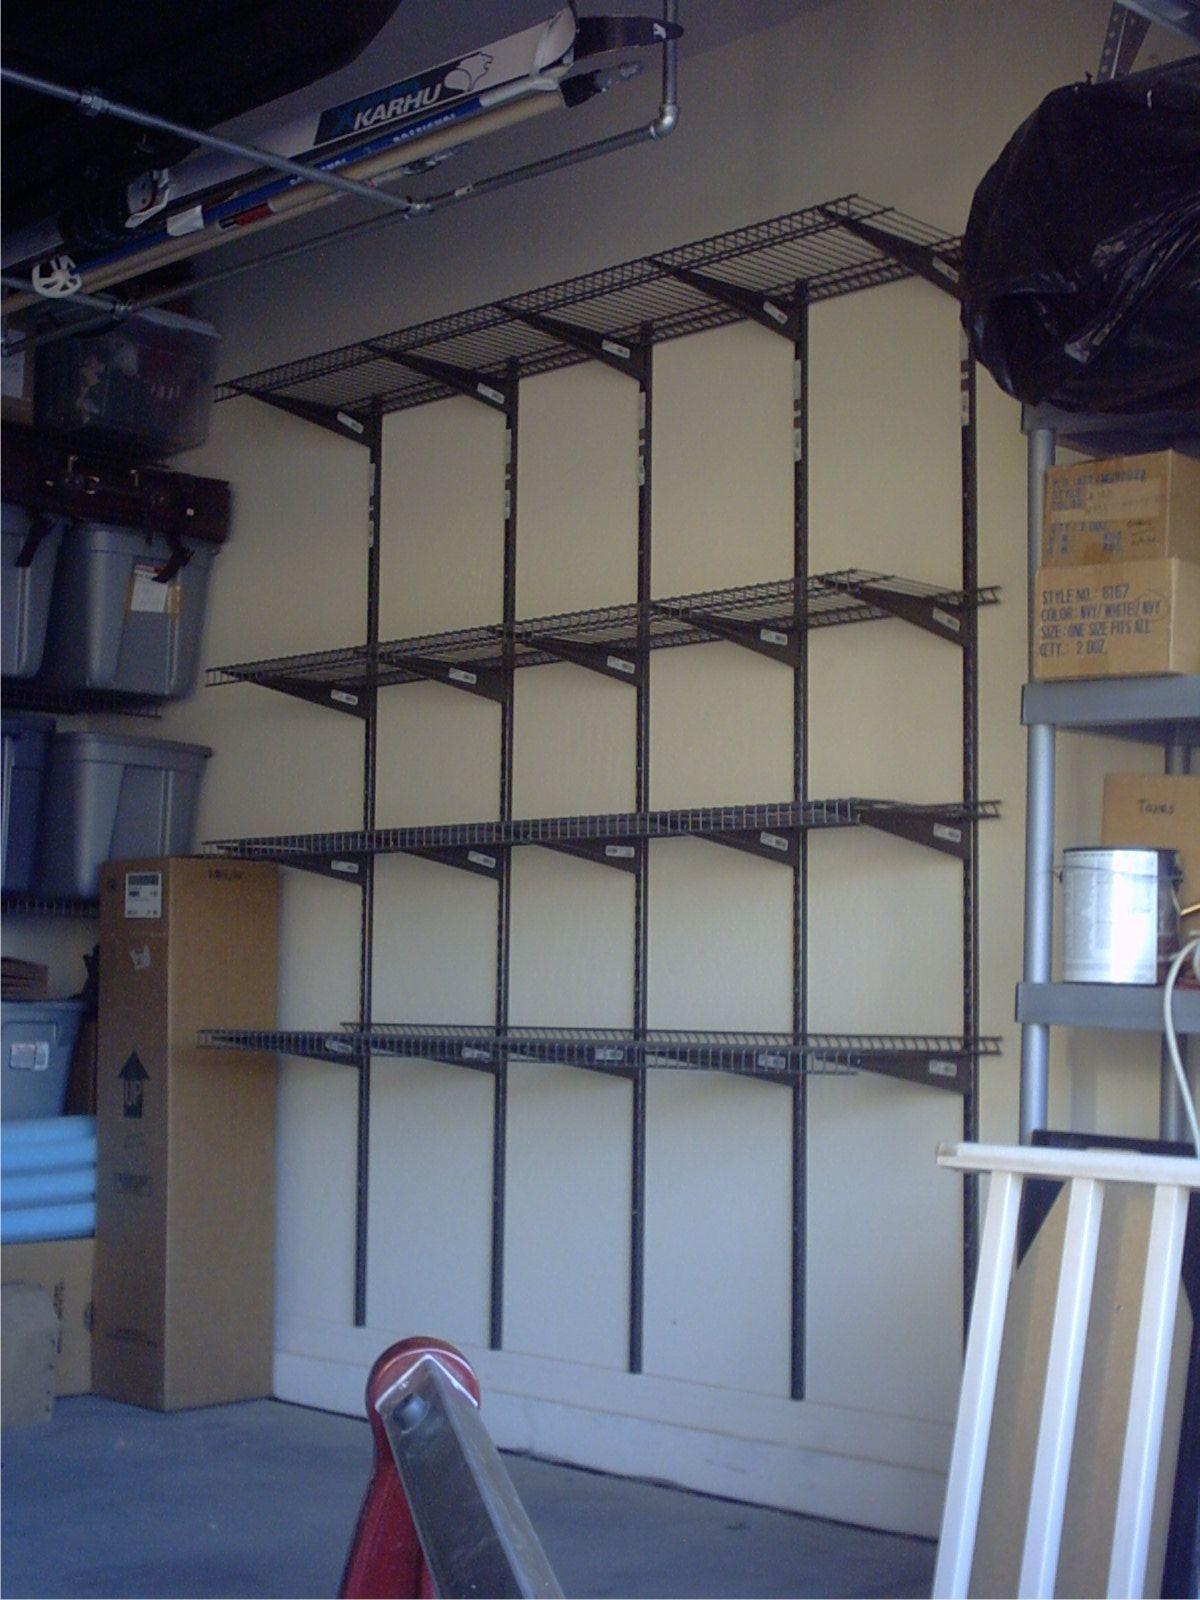 garage storage with images garage storage solutions on inspiring diy garage storage design ideas on a budget to maximize your garage id=78408